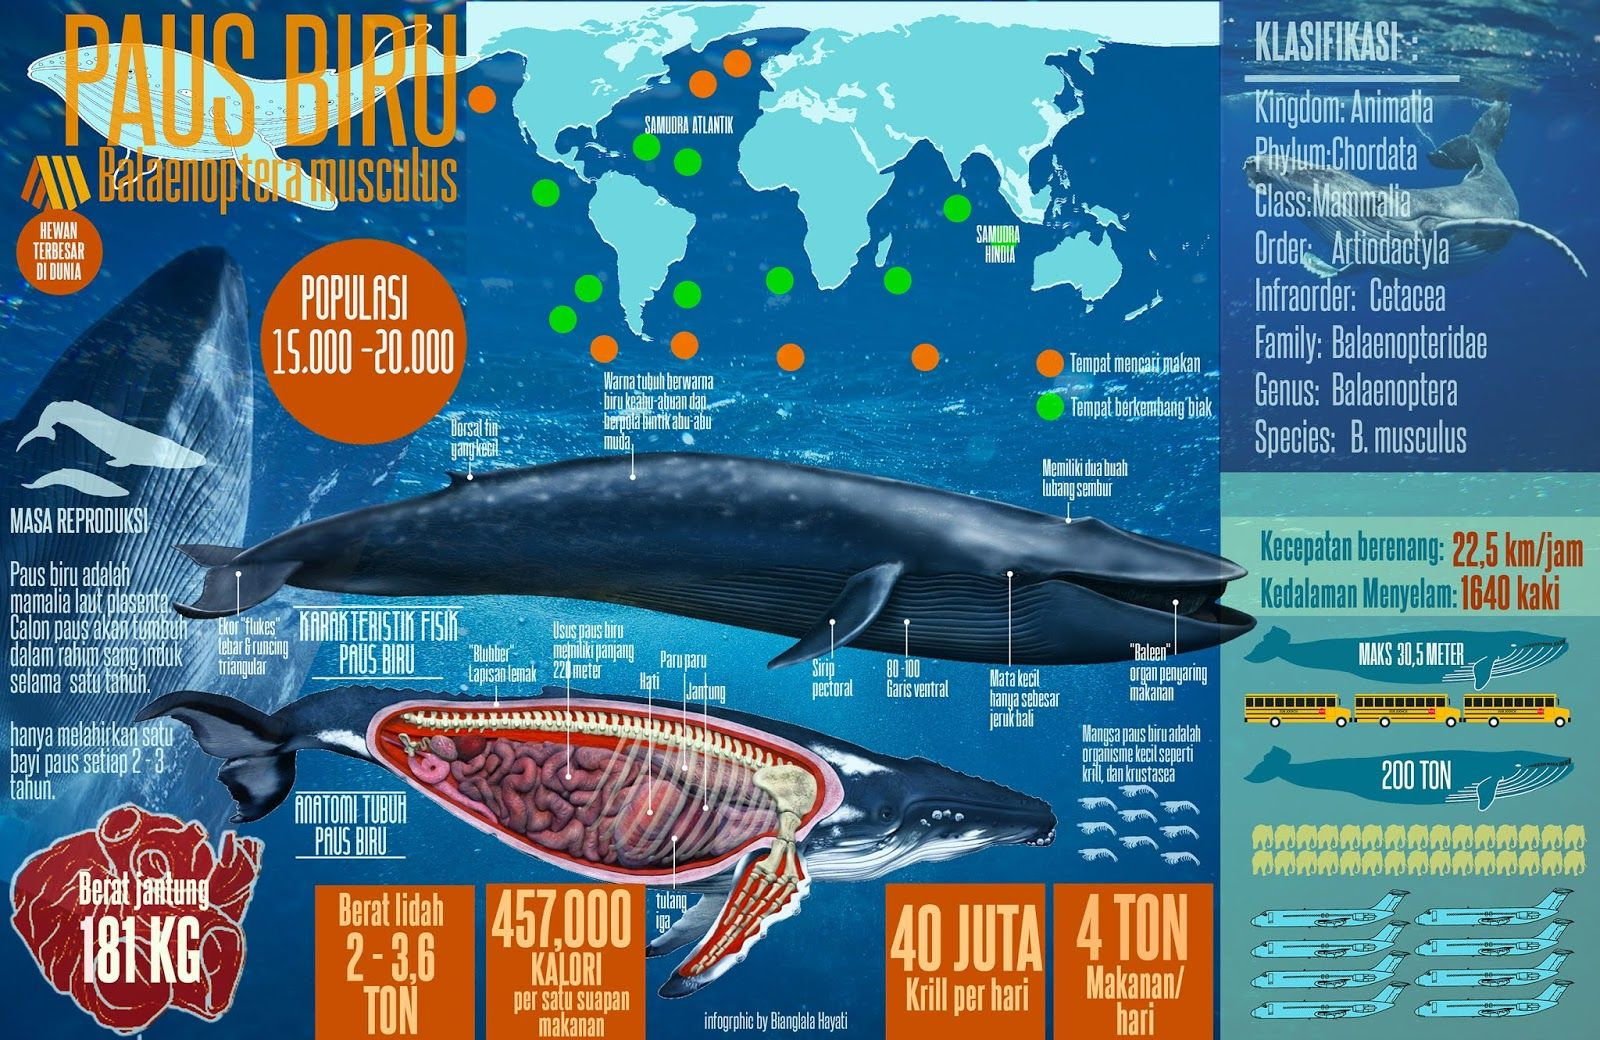 Gambar Infografik Paus Biru Di 2020 Paus Biru Biru Mamalia